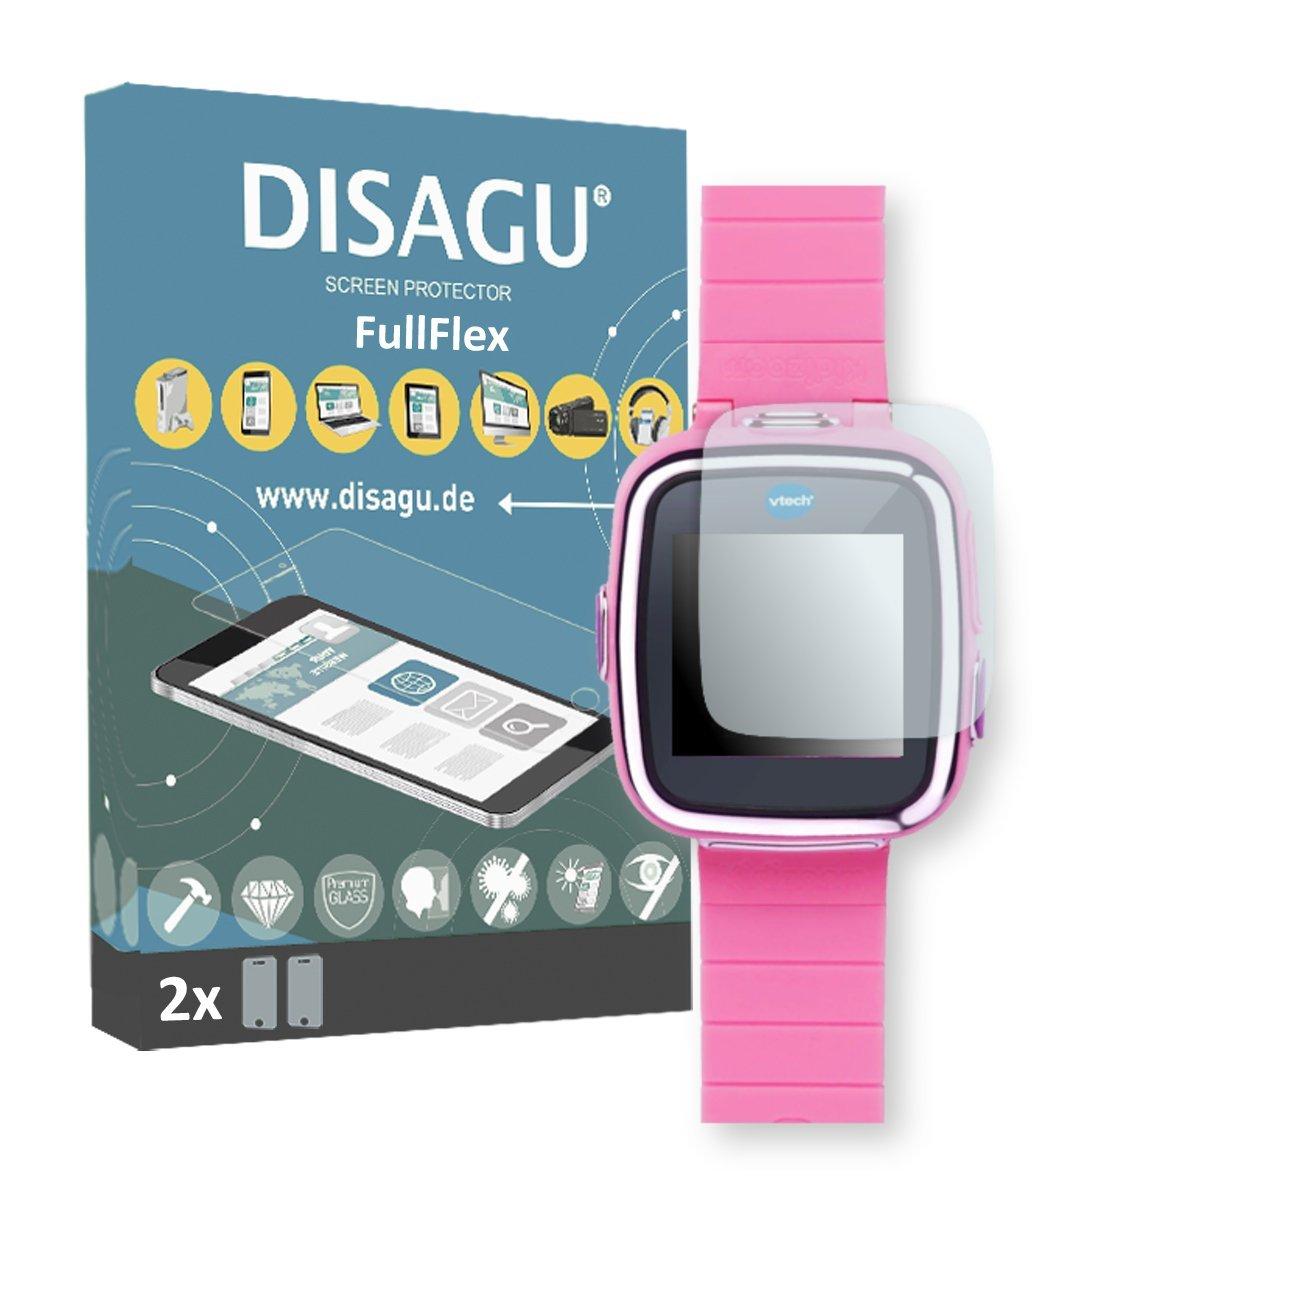 DISAGU 2 x FullFlex screen protector for Vtech Kidizoom Smart Watch 2 foil screen protector